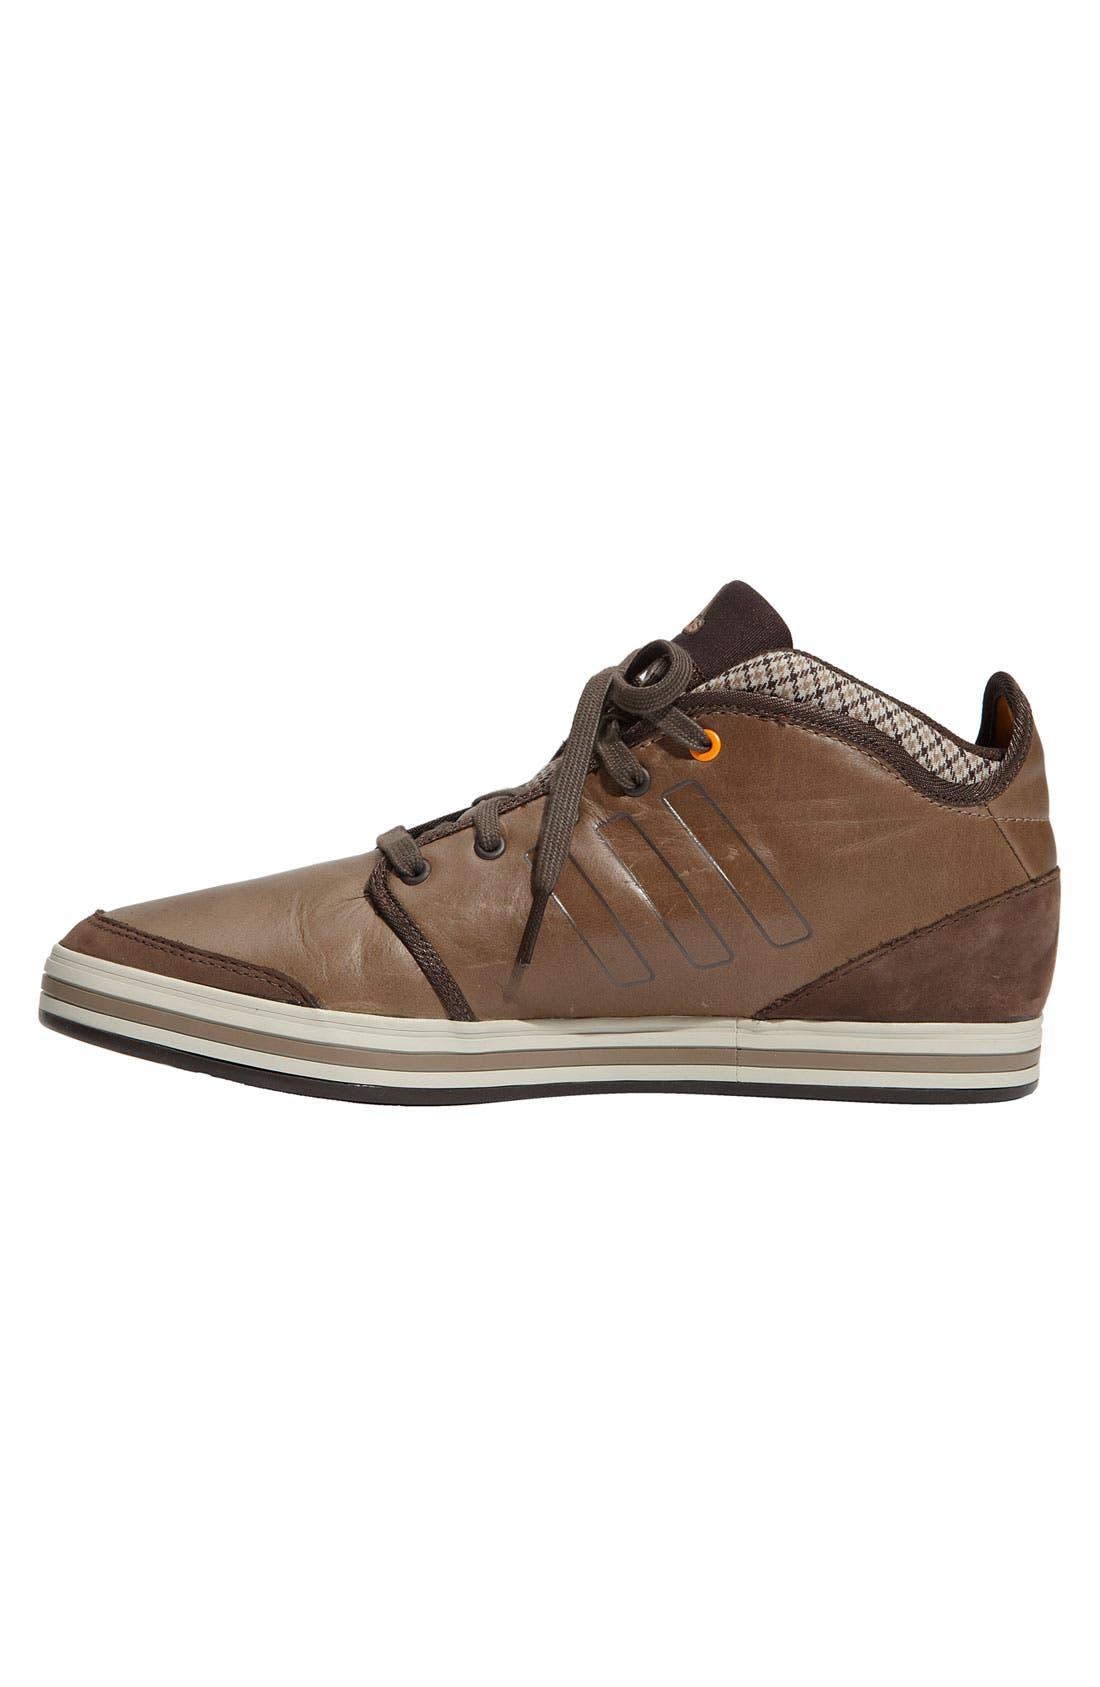 'Zeitfrei Mid' Sneaker,                             Alternate thumbnail 2, color,                             200